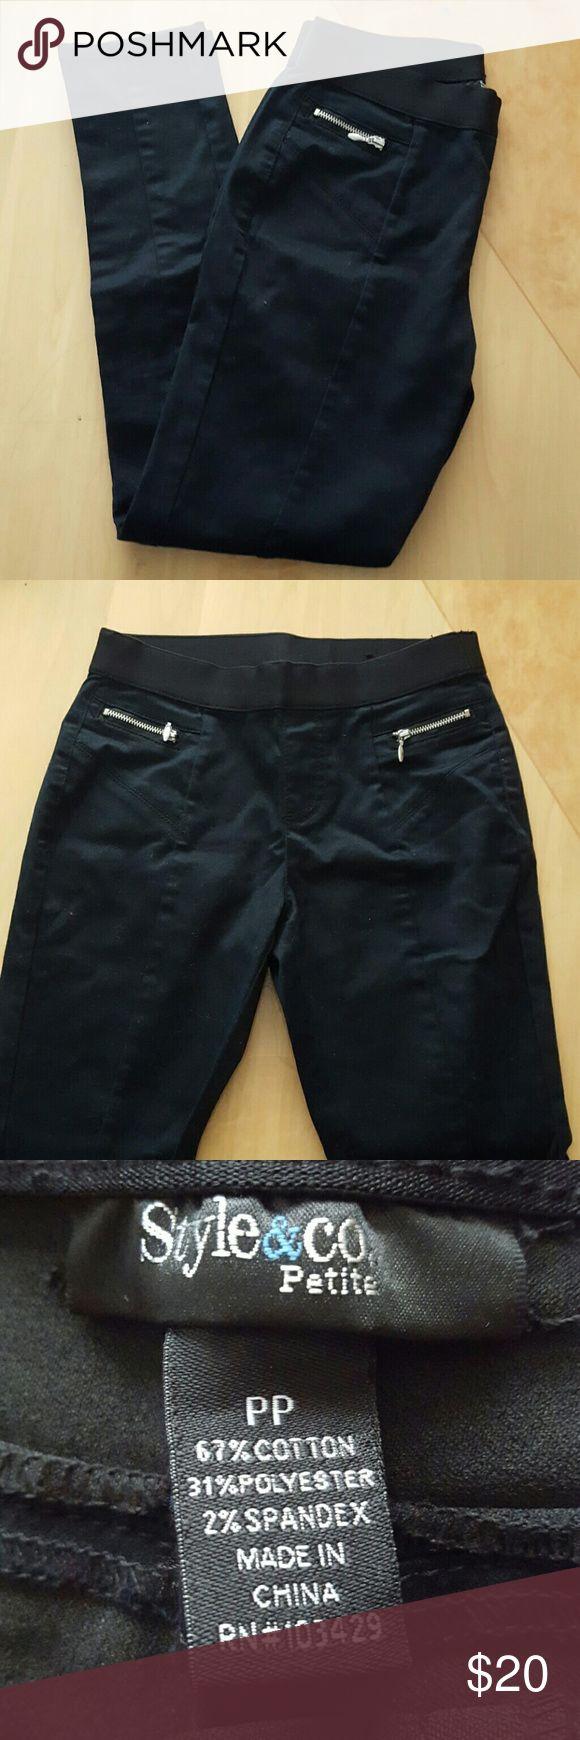 Sleek Black Petite Leggings Sleek black leggings from Style & Co. Size PP. Petite small. Worn once or twice. Style & Co Pants Leggings